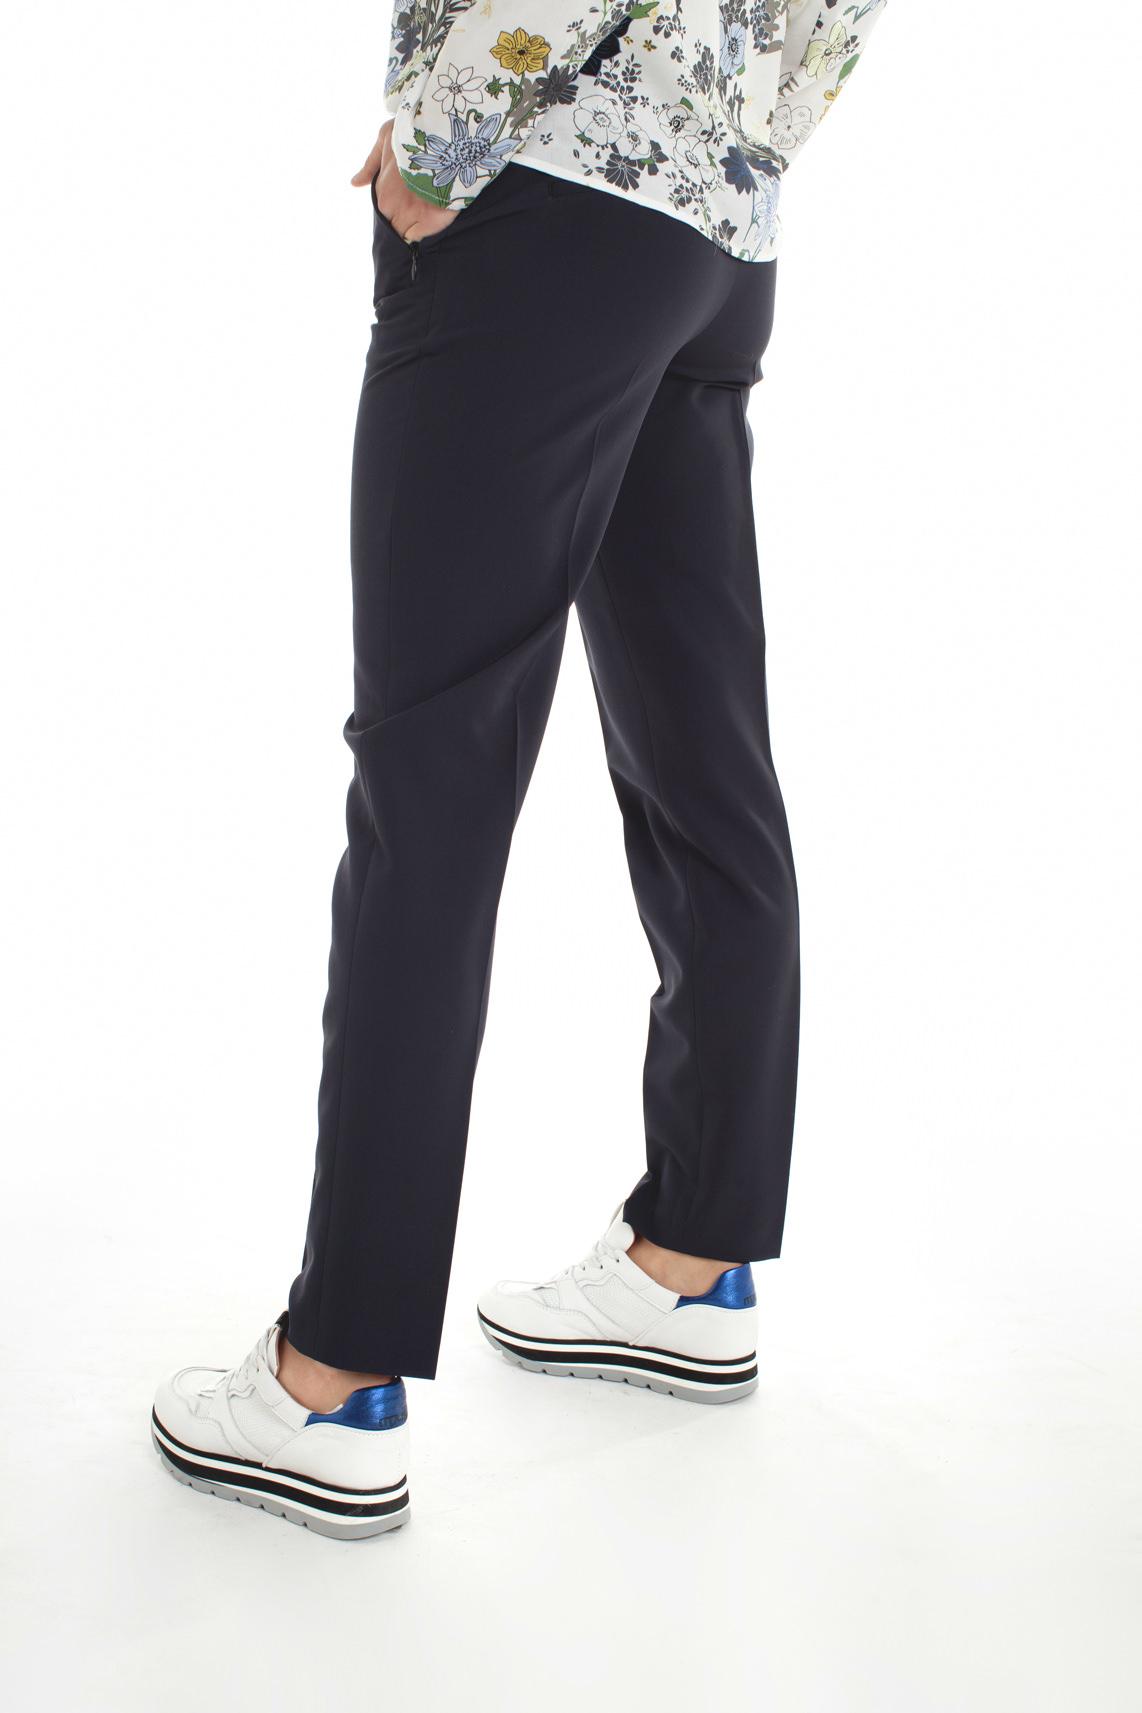 Rosner Dames Alisa pantalon Blauw